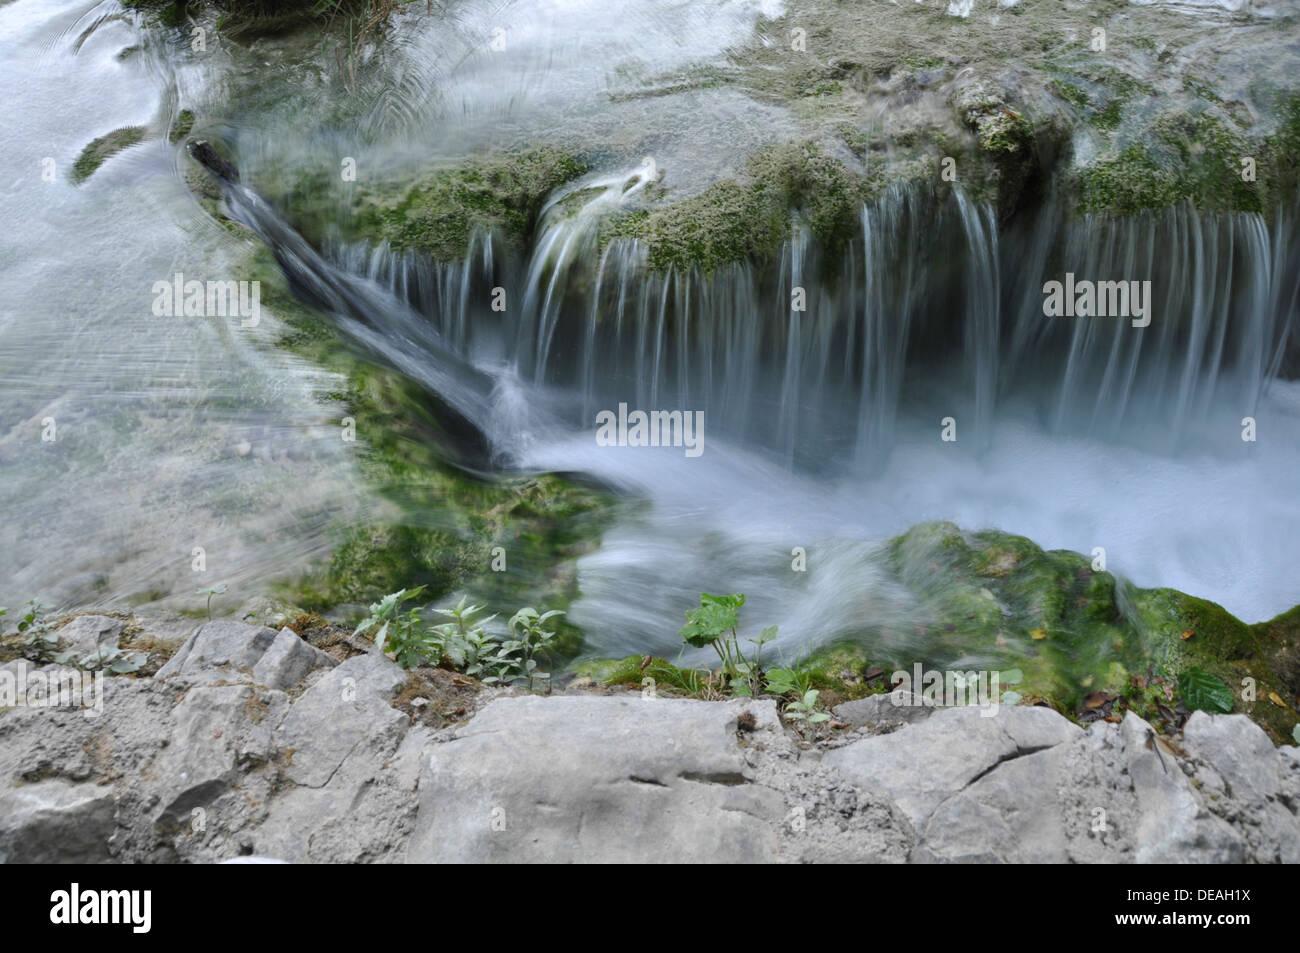 Natural waterfalls and cascades photographed at Plitvice Lakes National Park, Croatia Stock Photo